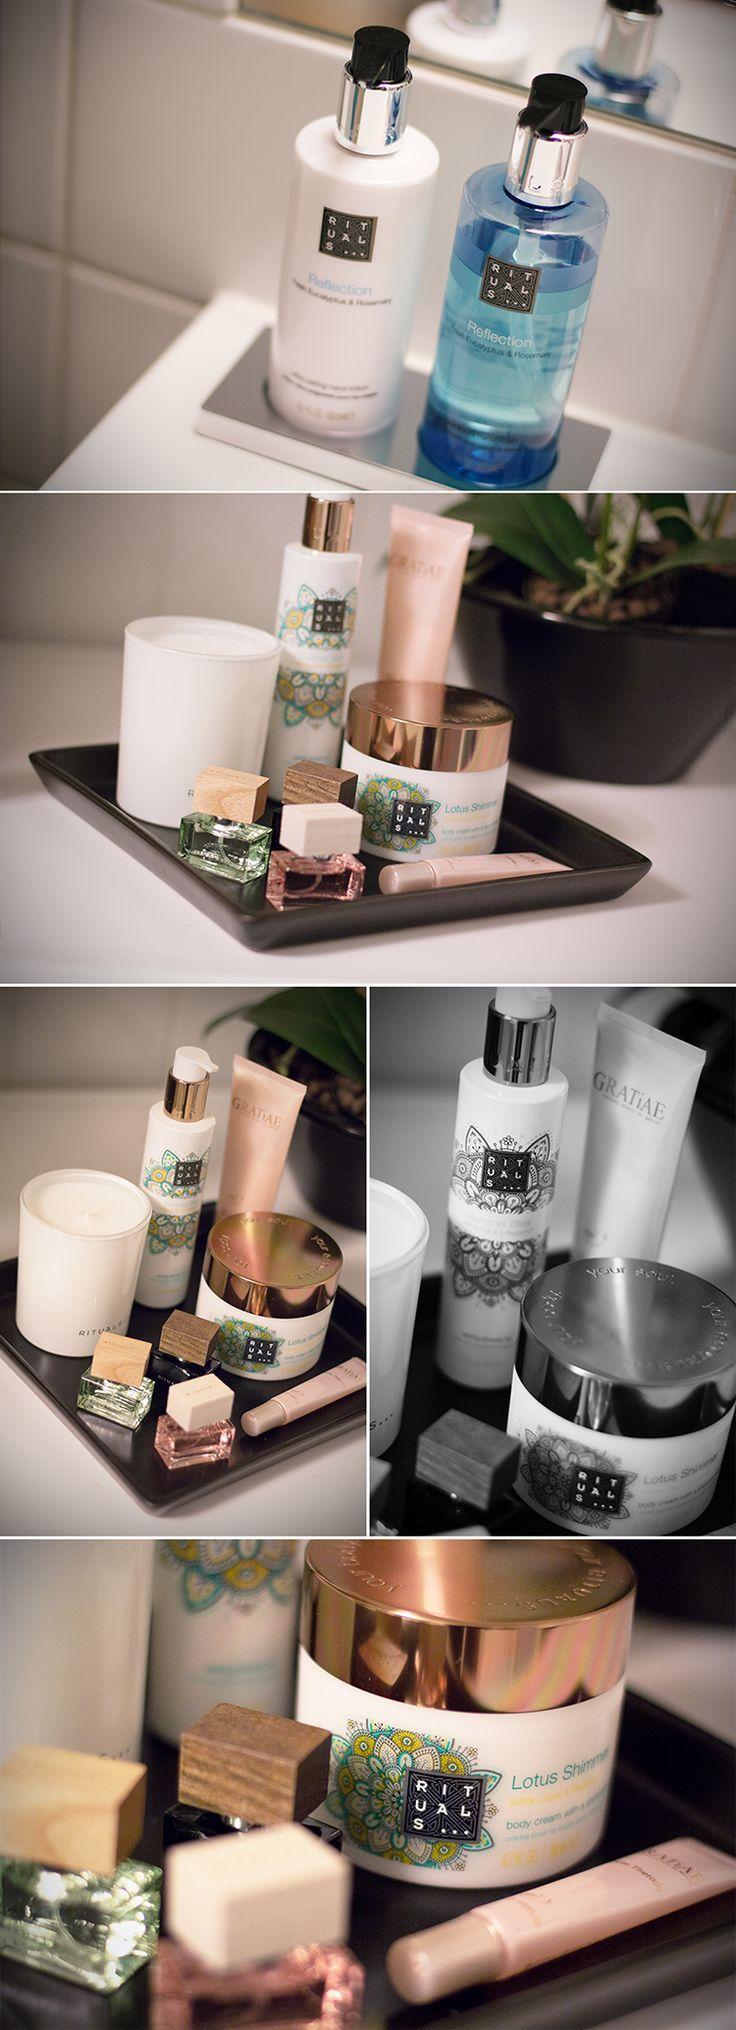 Badezimmer Dekoration Tablett Rituals Kosmetik Rituale Hautpflege Seife B Badezimmer Dekoration Hautp Rituals Products Bathroom Decor Rituals